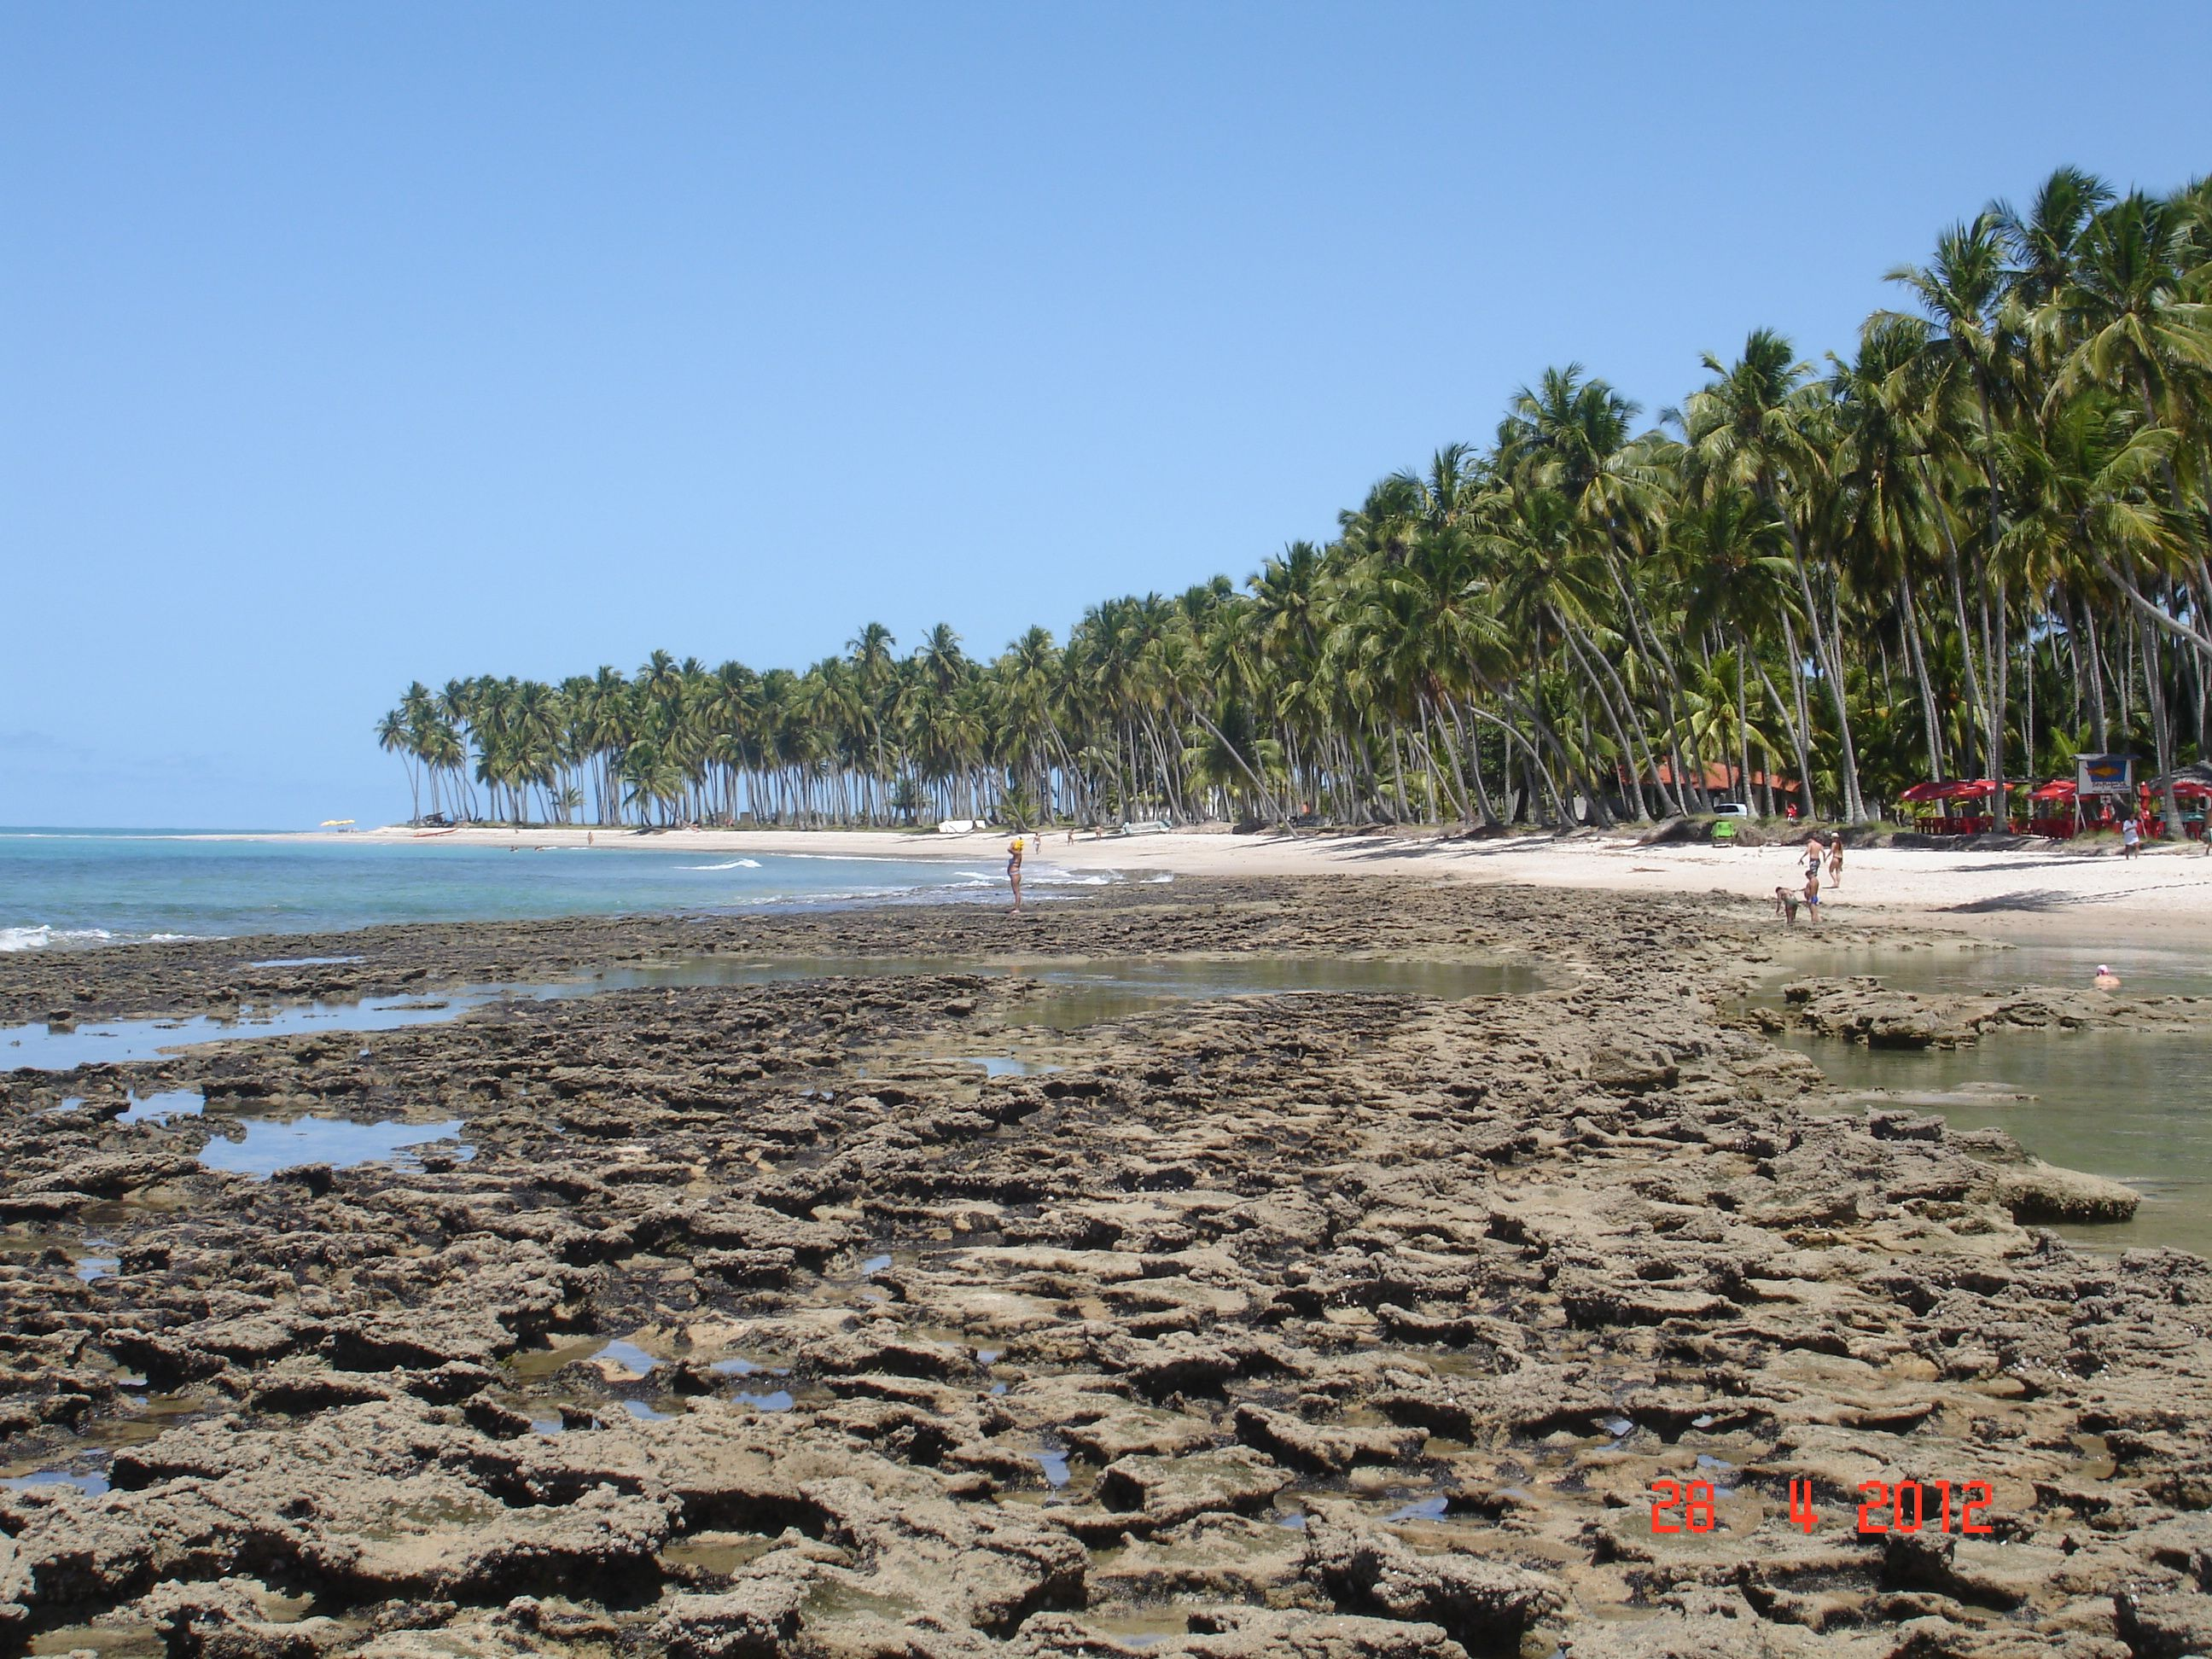 #Beach #Carneiros #Pernambuco #Brazil